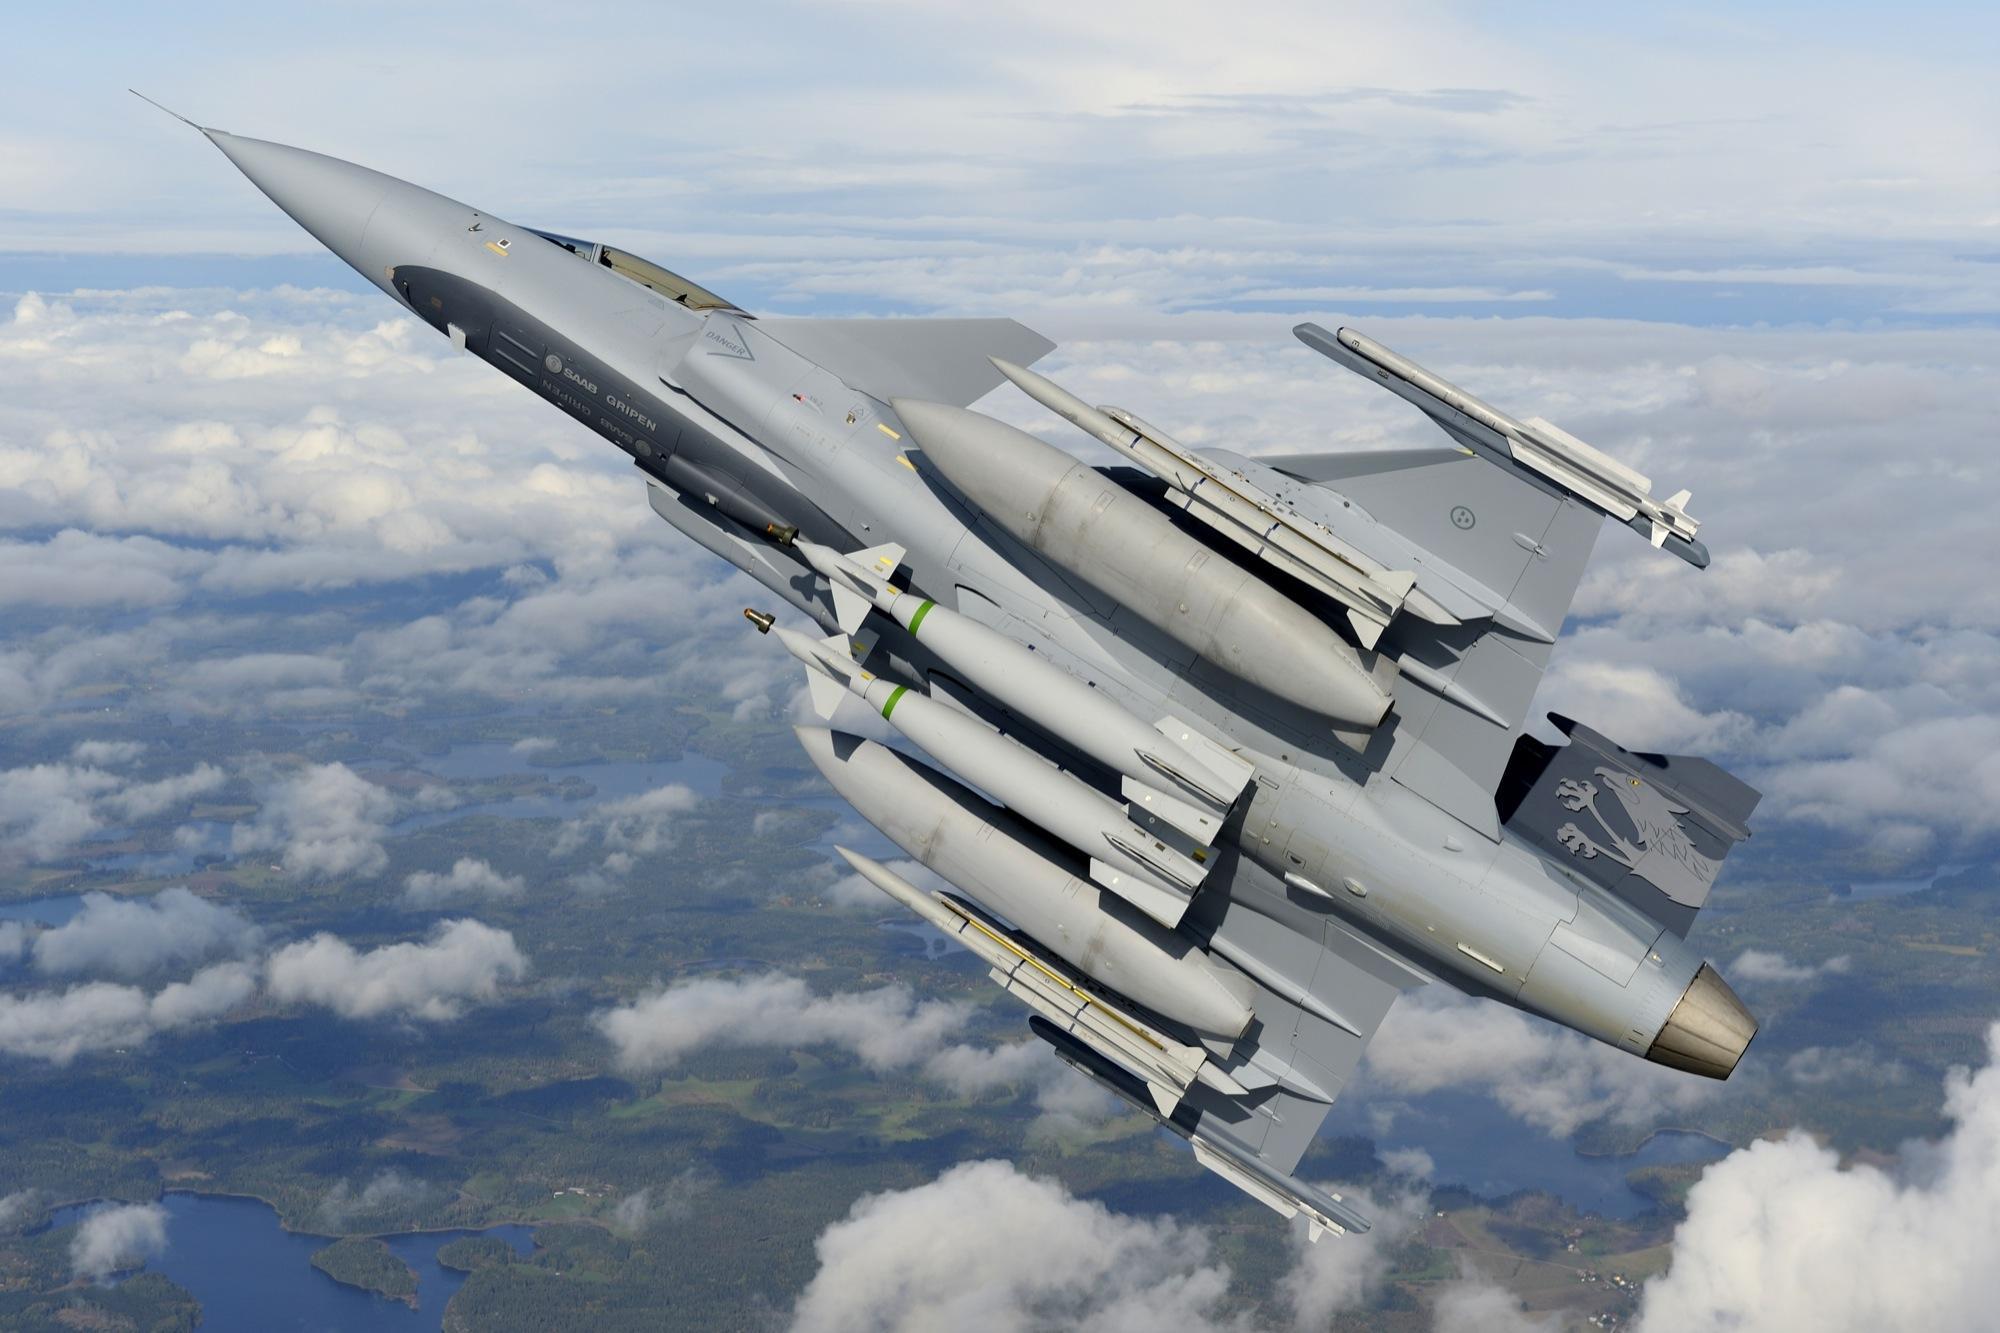 Gripen_NG_Demonstrator_armado_Meteor_Katsuhico_Tokunaga_SAAB